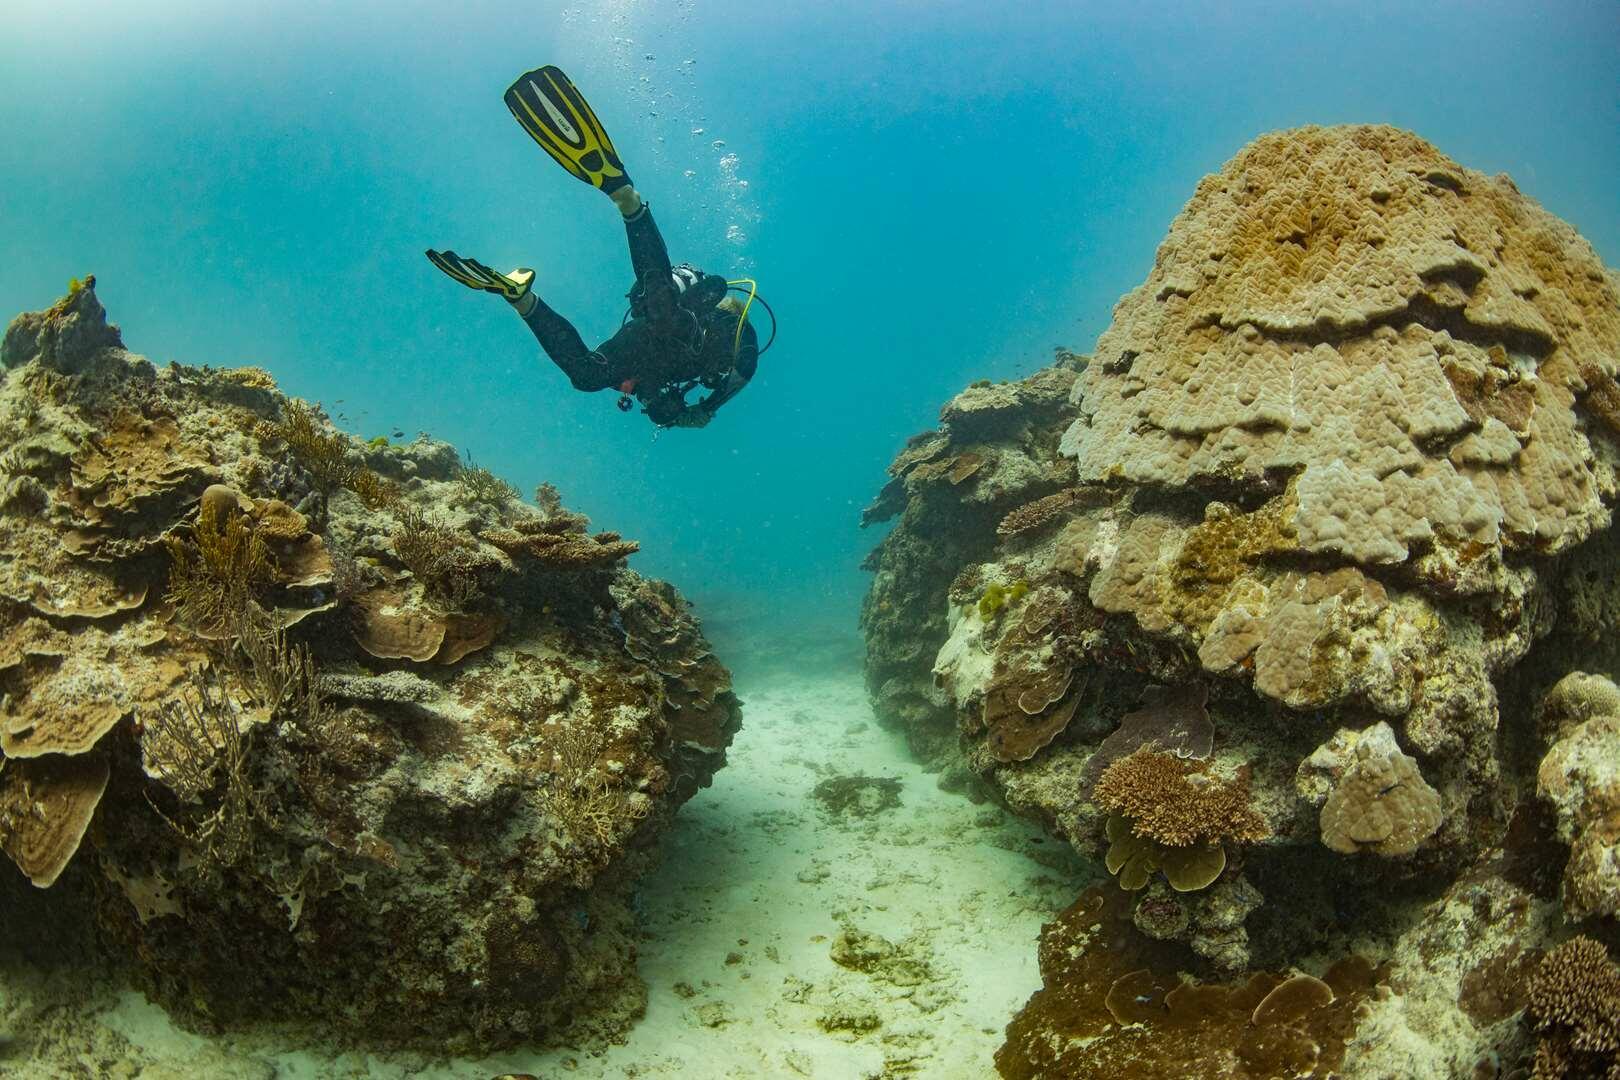 Diving at Heron Reef